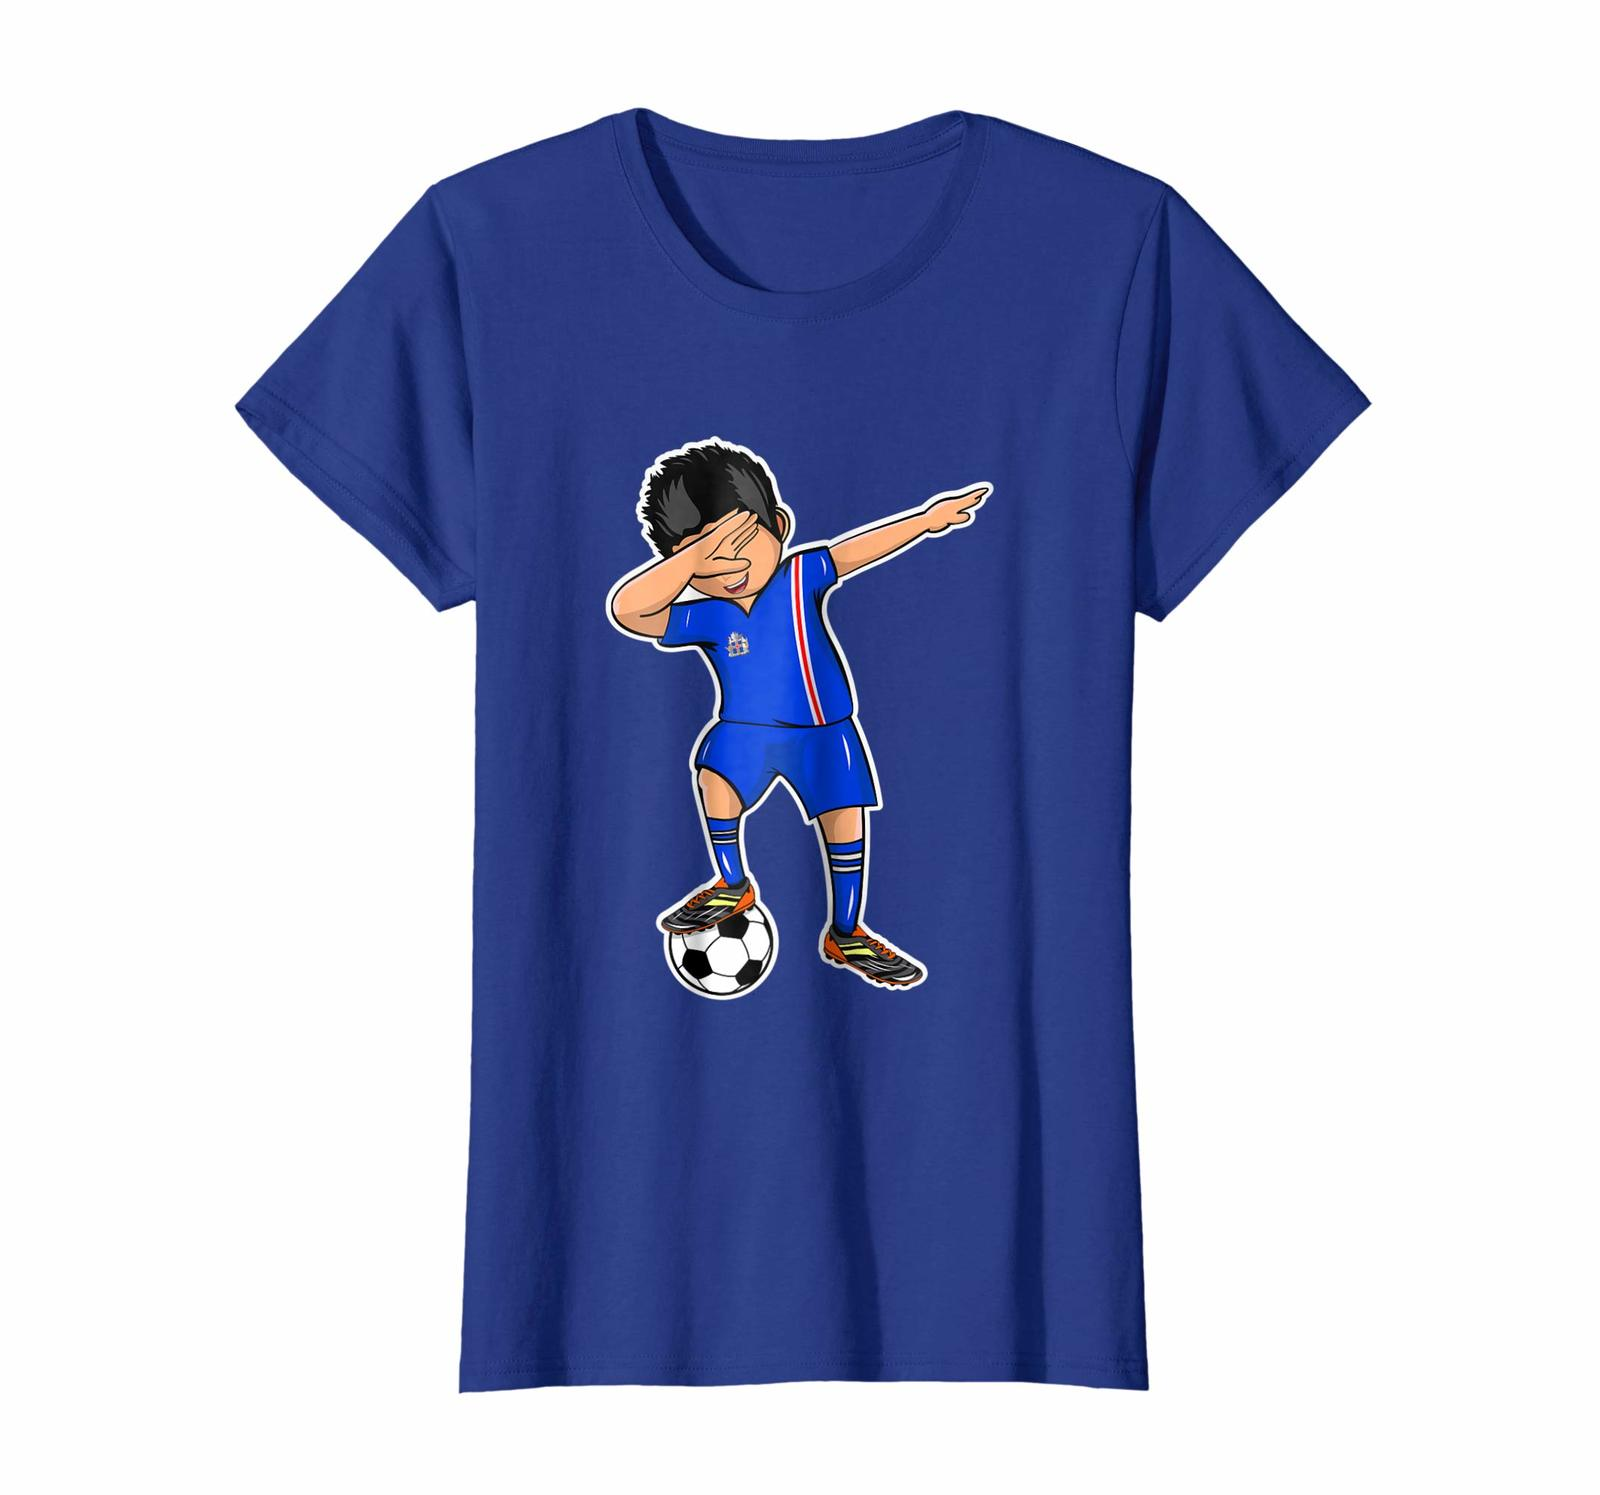 New Shirts - Dabbing Soccer Boy Iceland Jersey T Shirt Football Fan Wowen